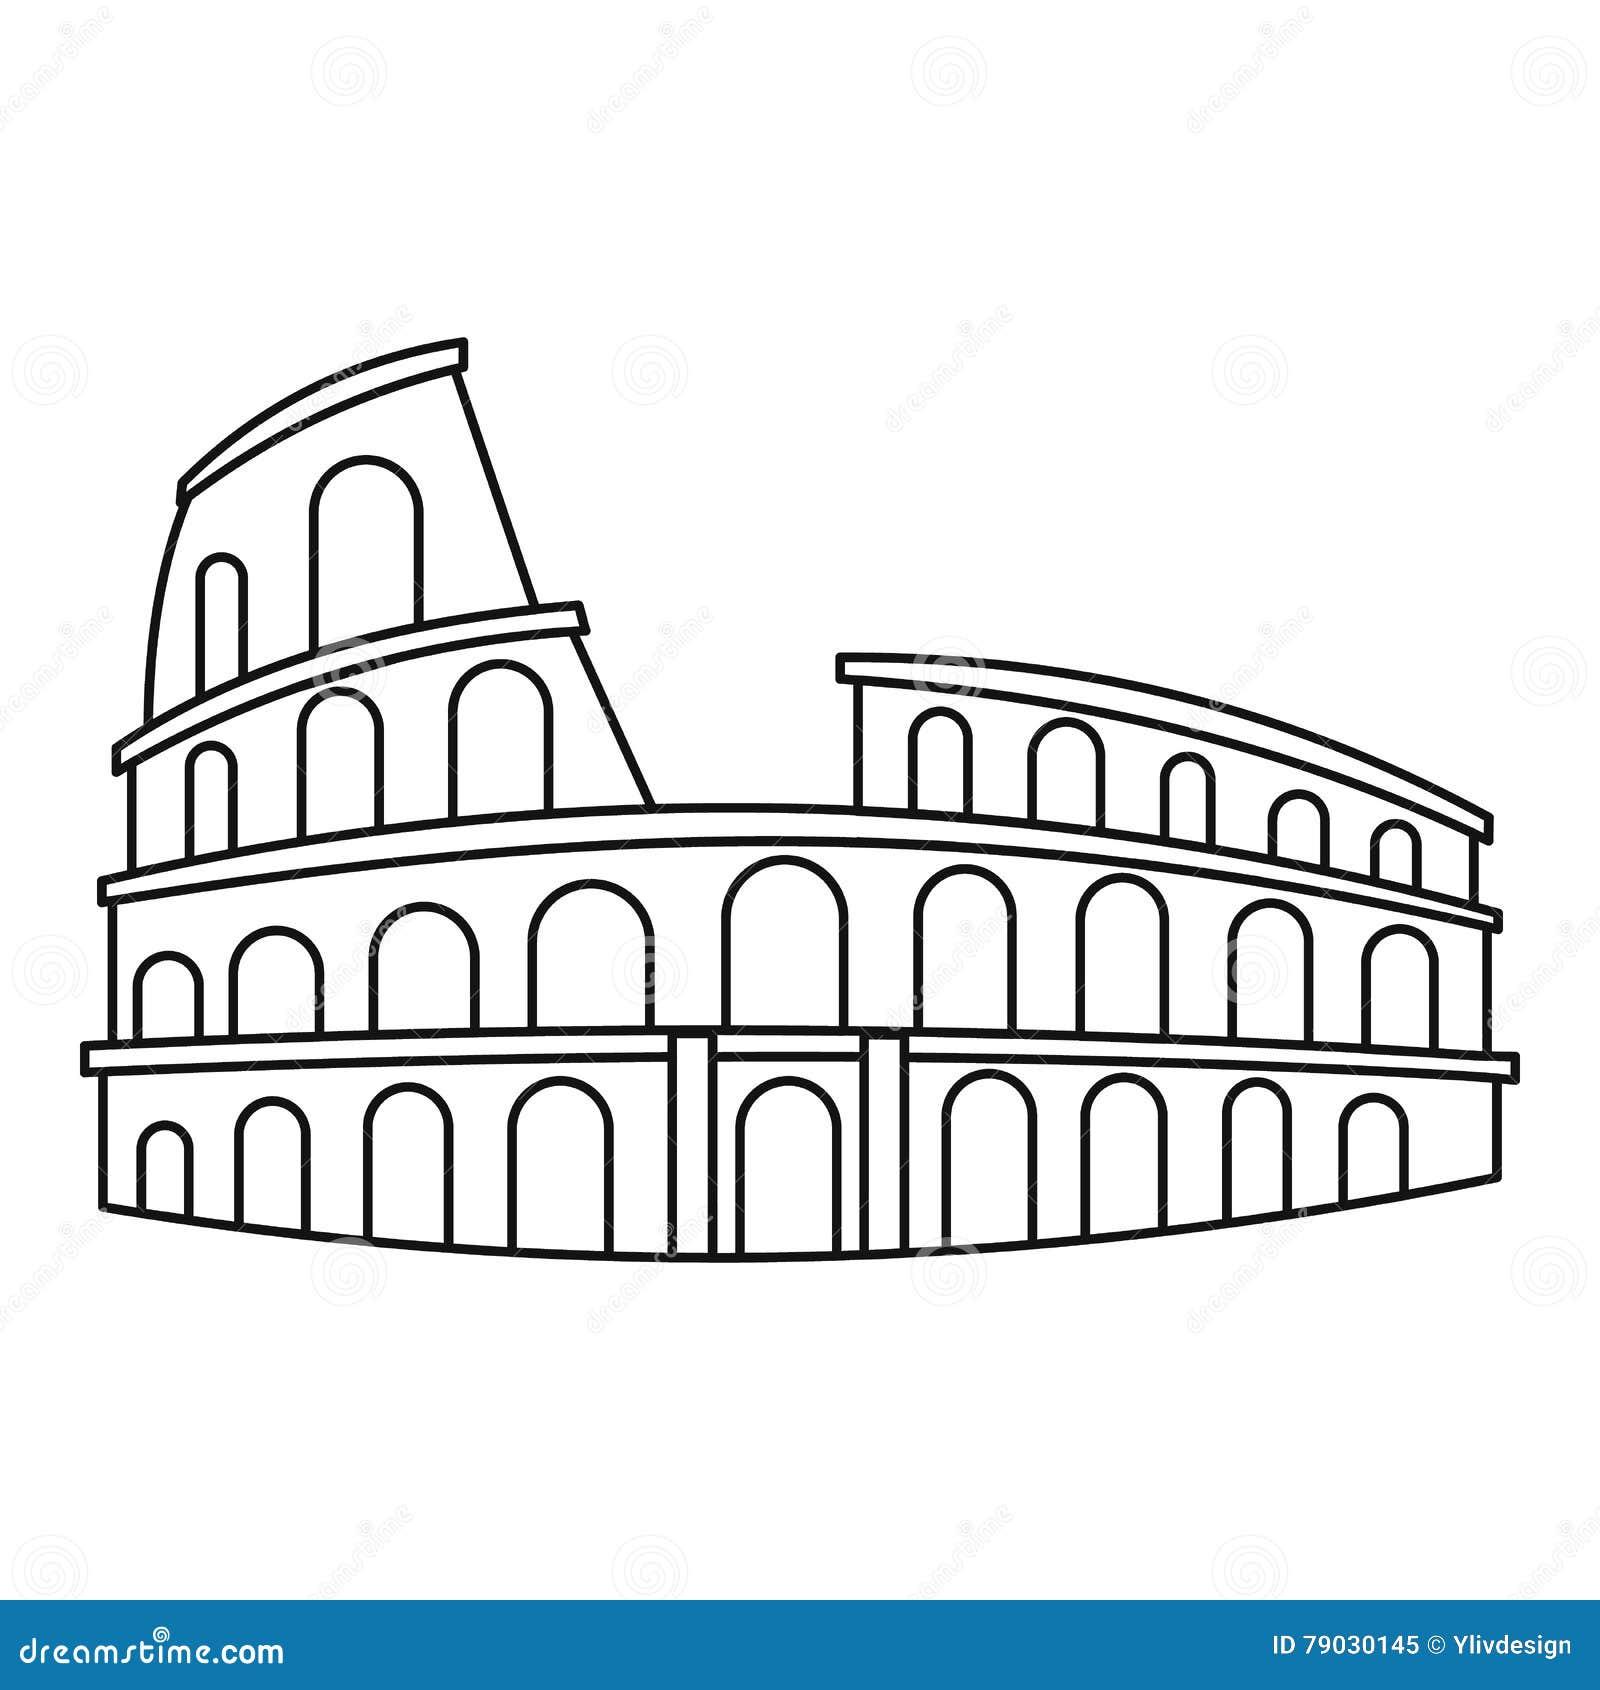 Il Nuraghe Di Cacciuto Salvatore, Monastir - Address, Hours, Reviews, Images